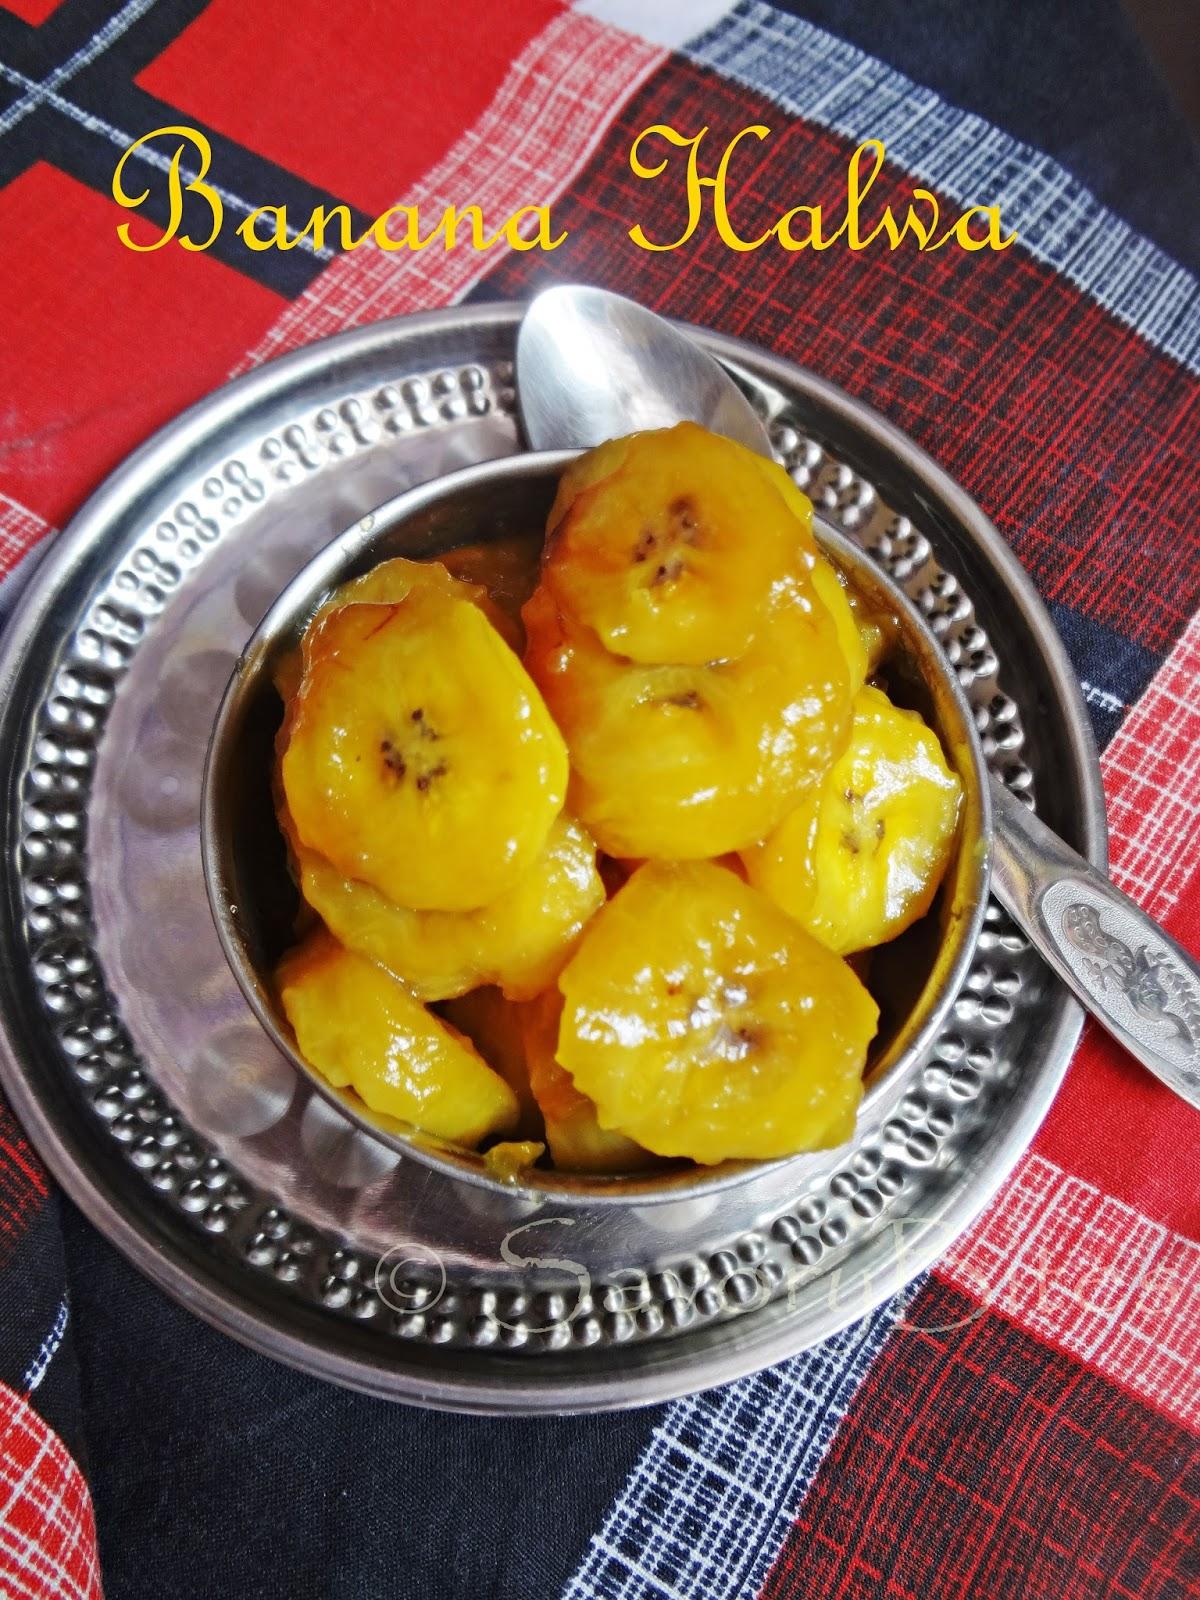 Kerala Banana Moira Banana Mandoli Banana Halwa Kelyacho Halwo Goa